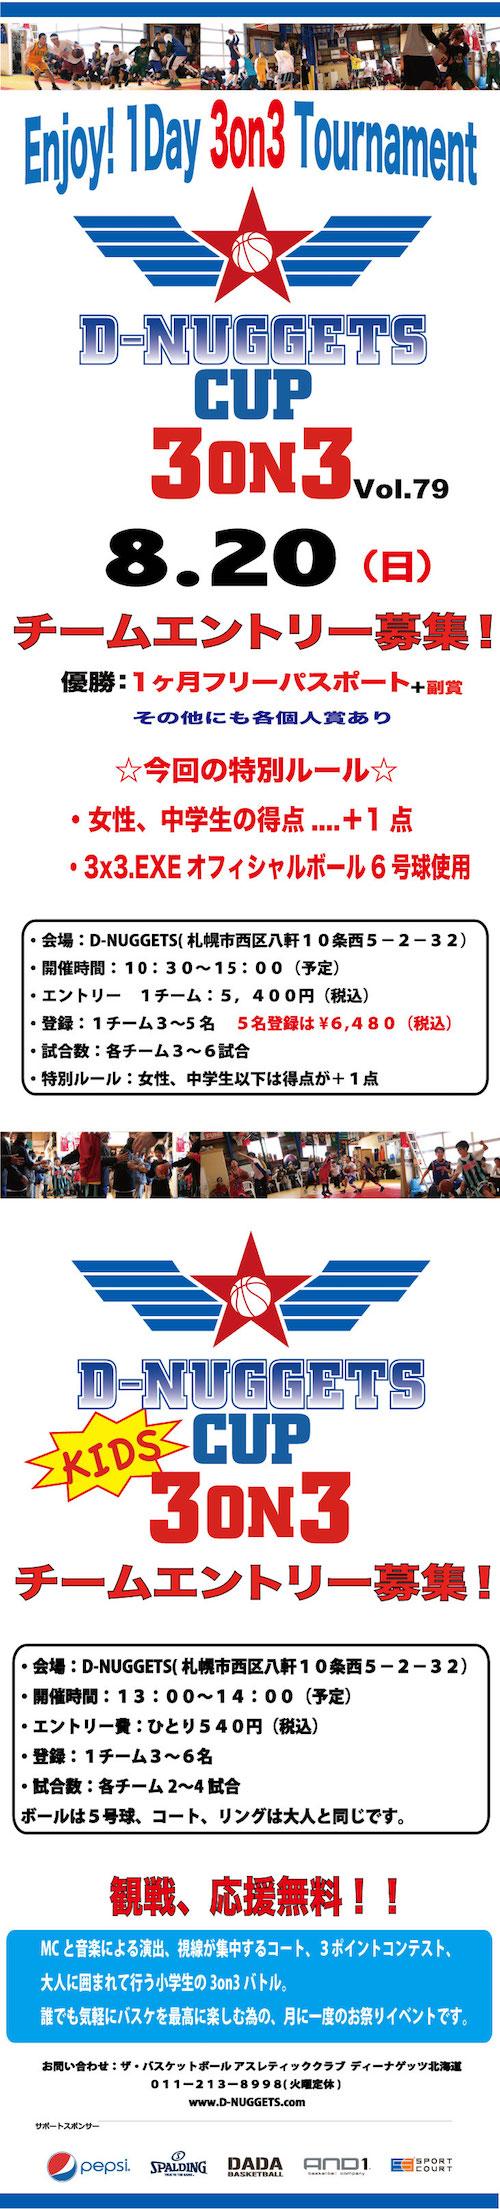 D-NUGGETS-CUP-HOKKAIDO-Vol.79_.jpg